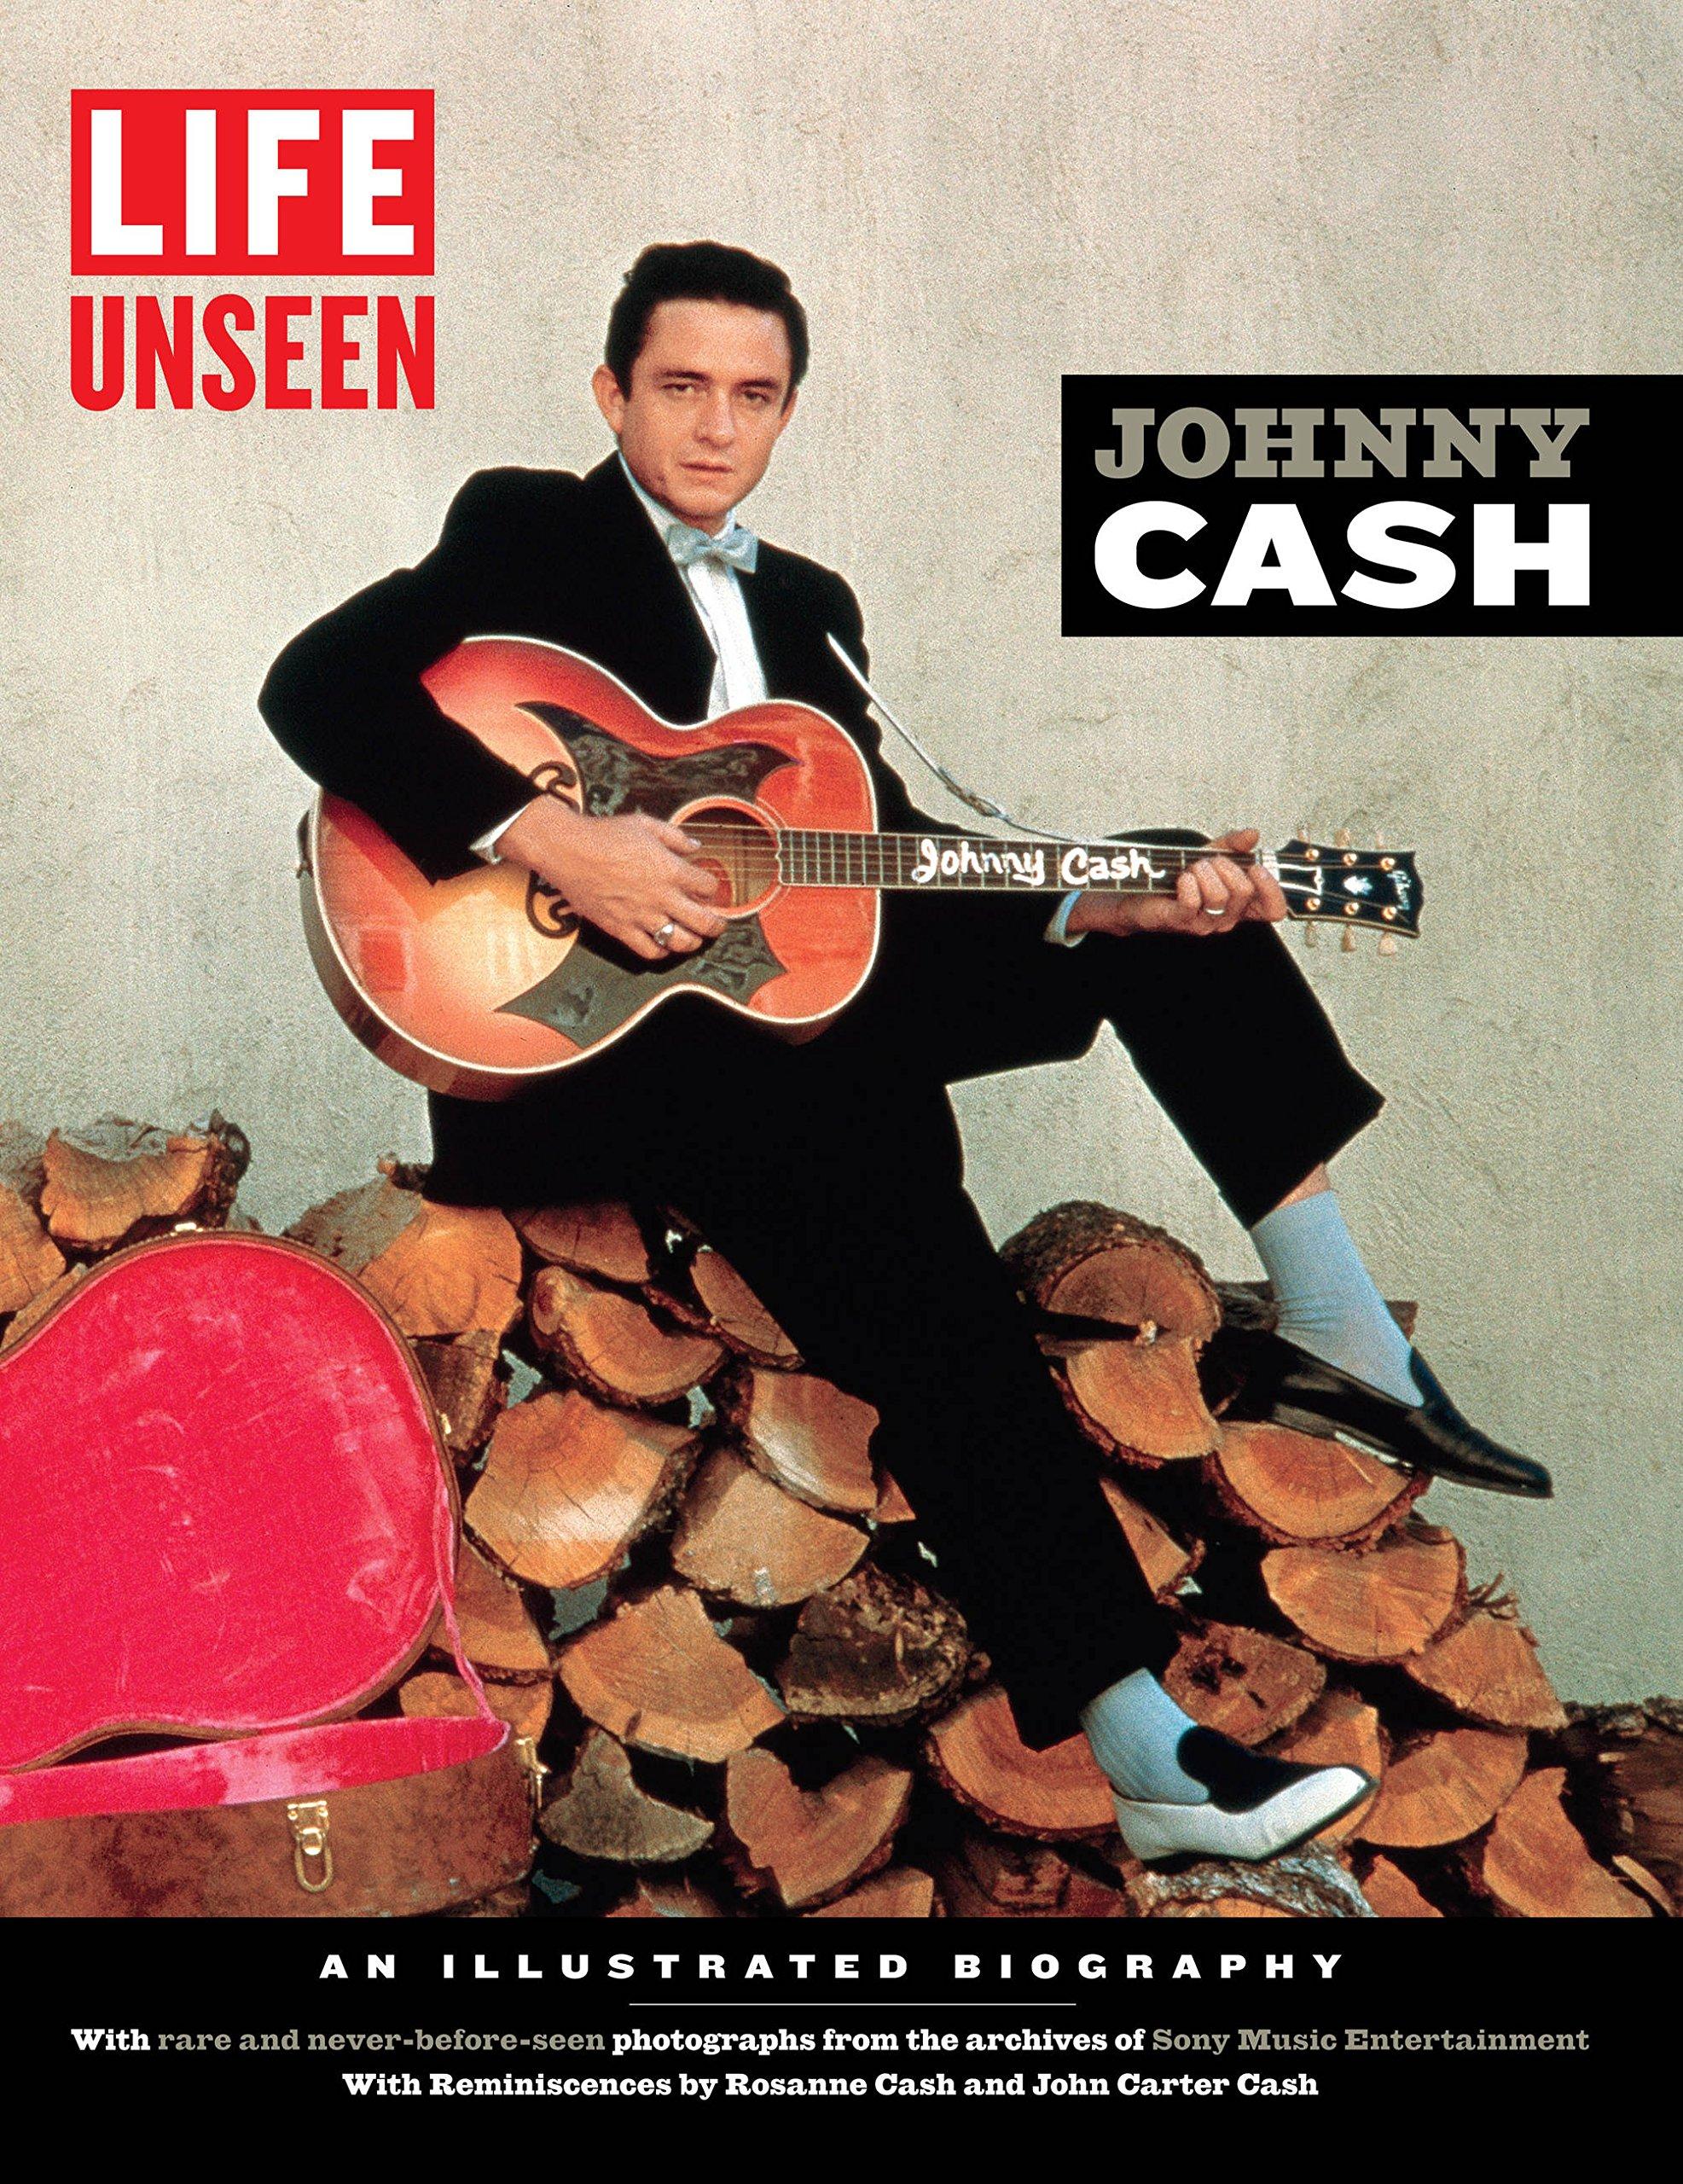 The Life Johnny Cash